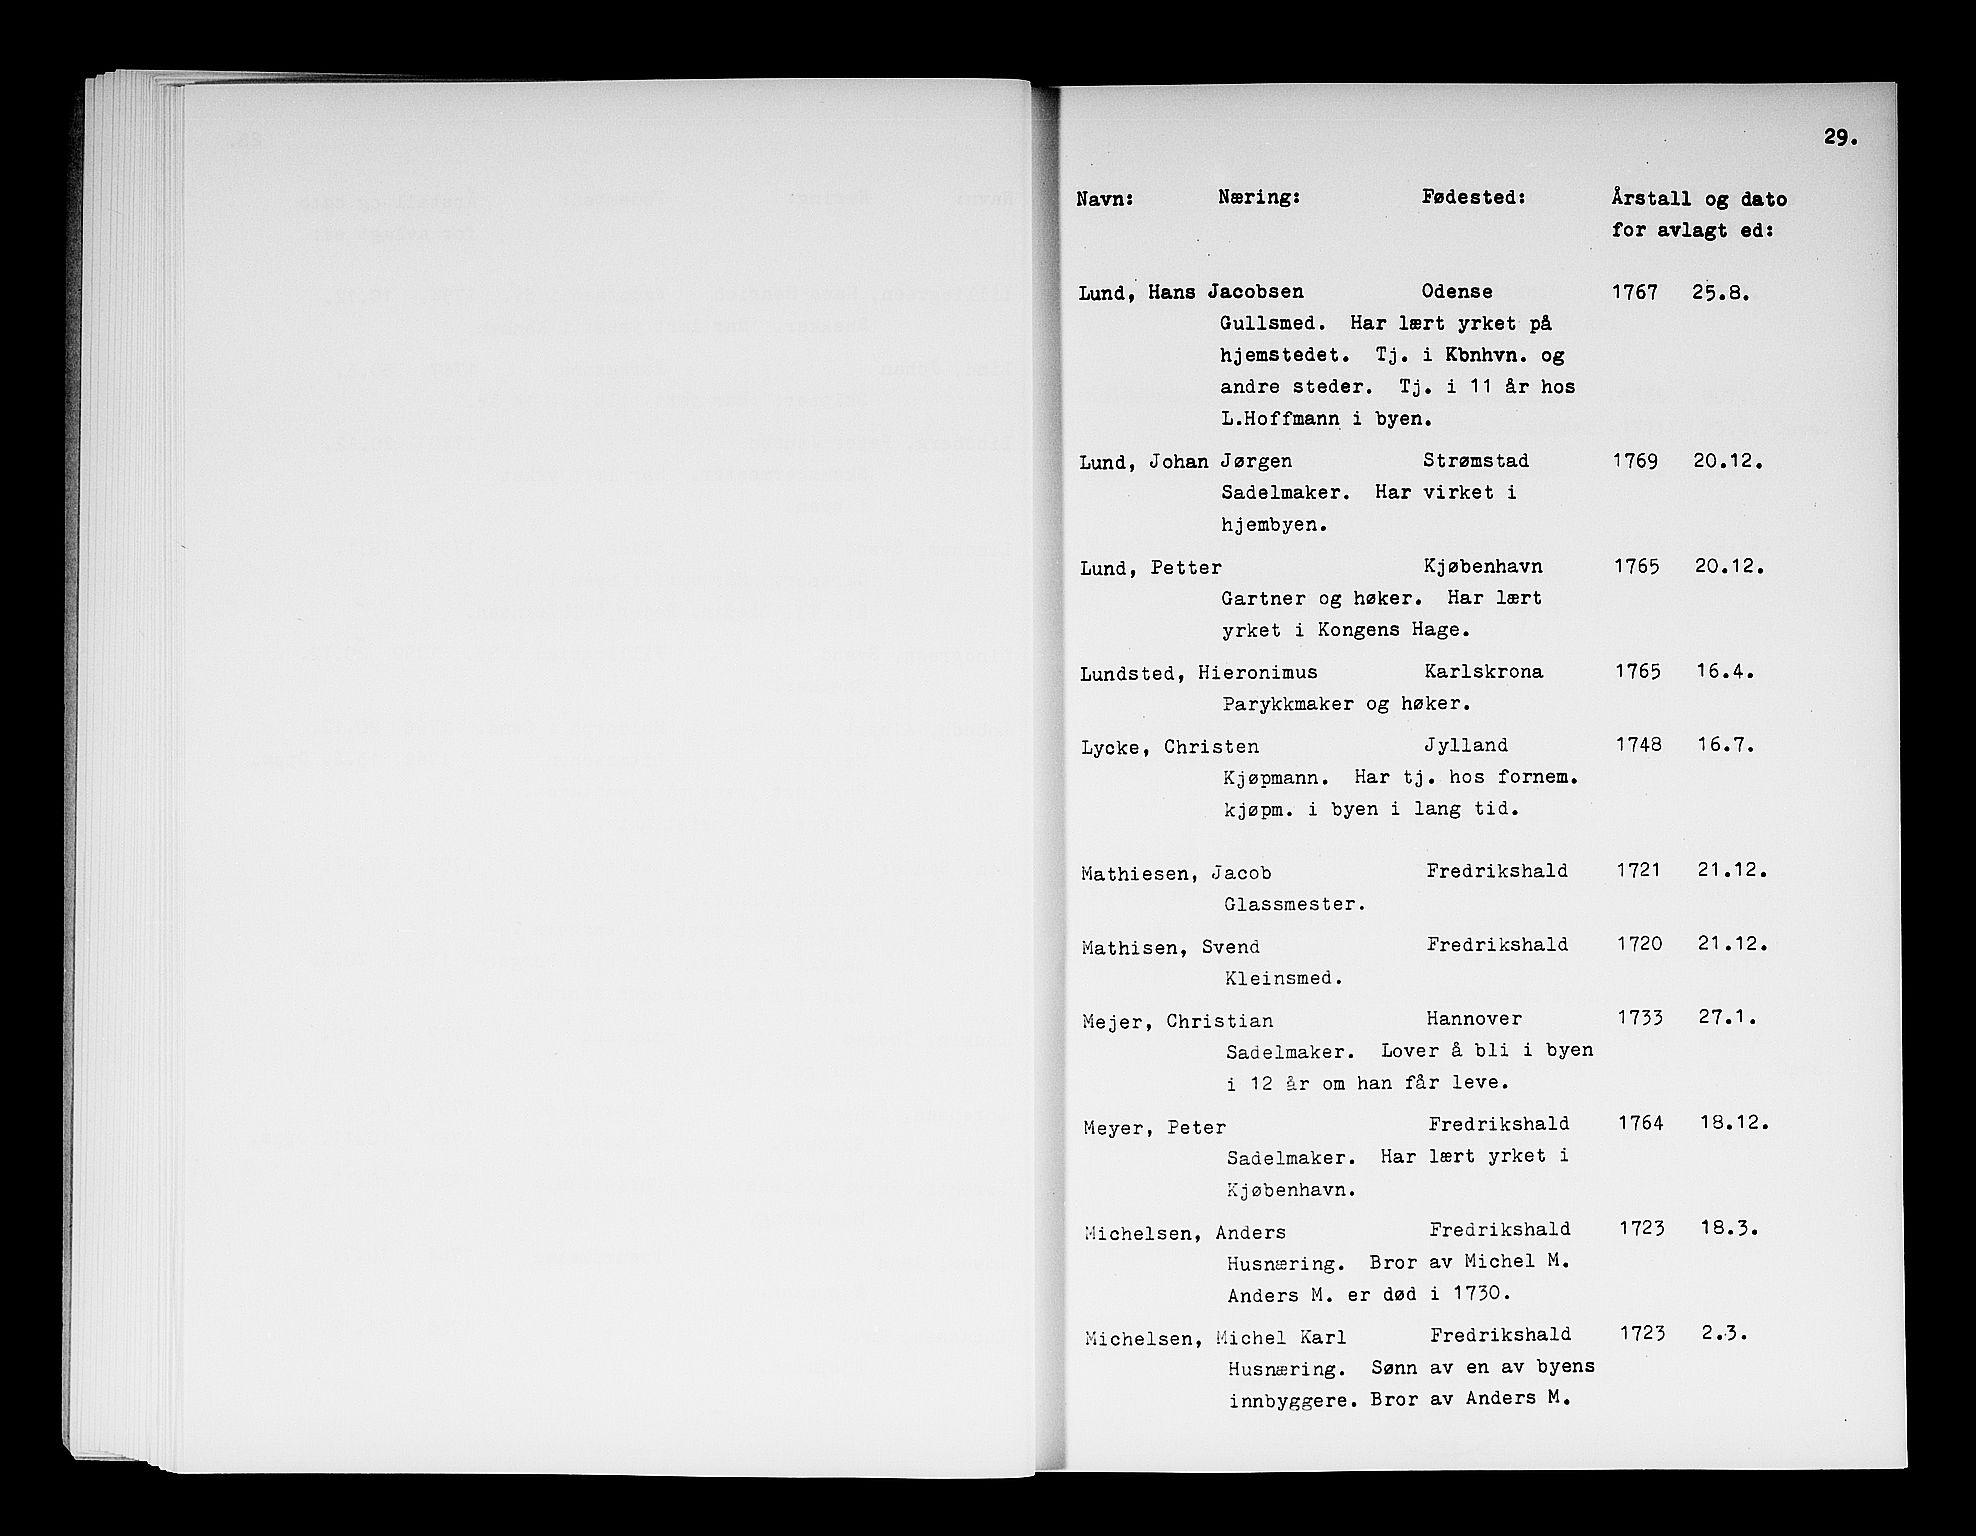 SAO, Fredrikshald rådstuerett, A/L0008: Alfabetisk fortegnelse over avlagte borgerskapseder, 1682-1772, s. 29